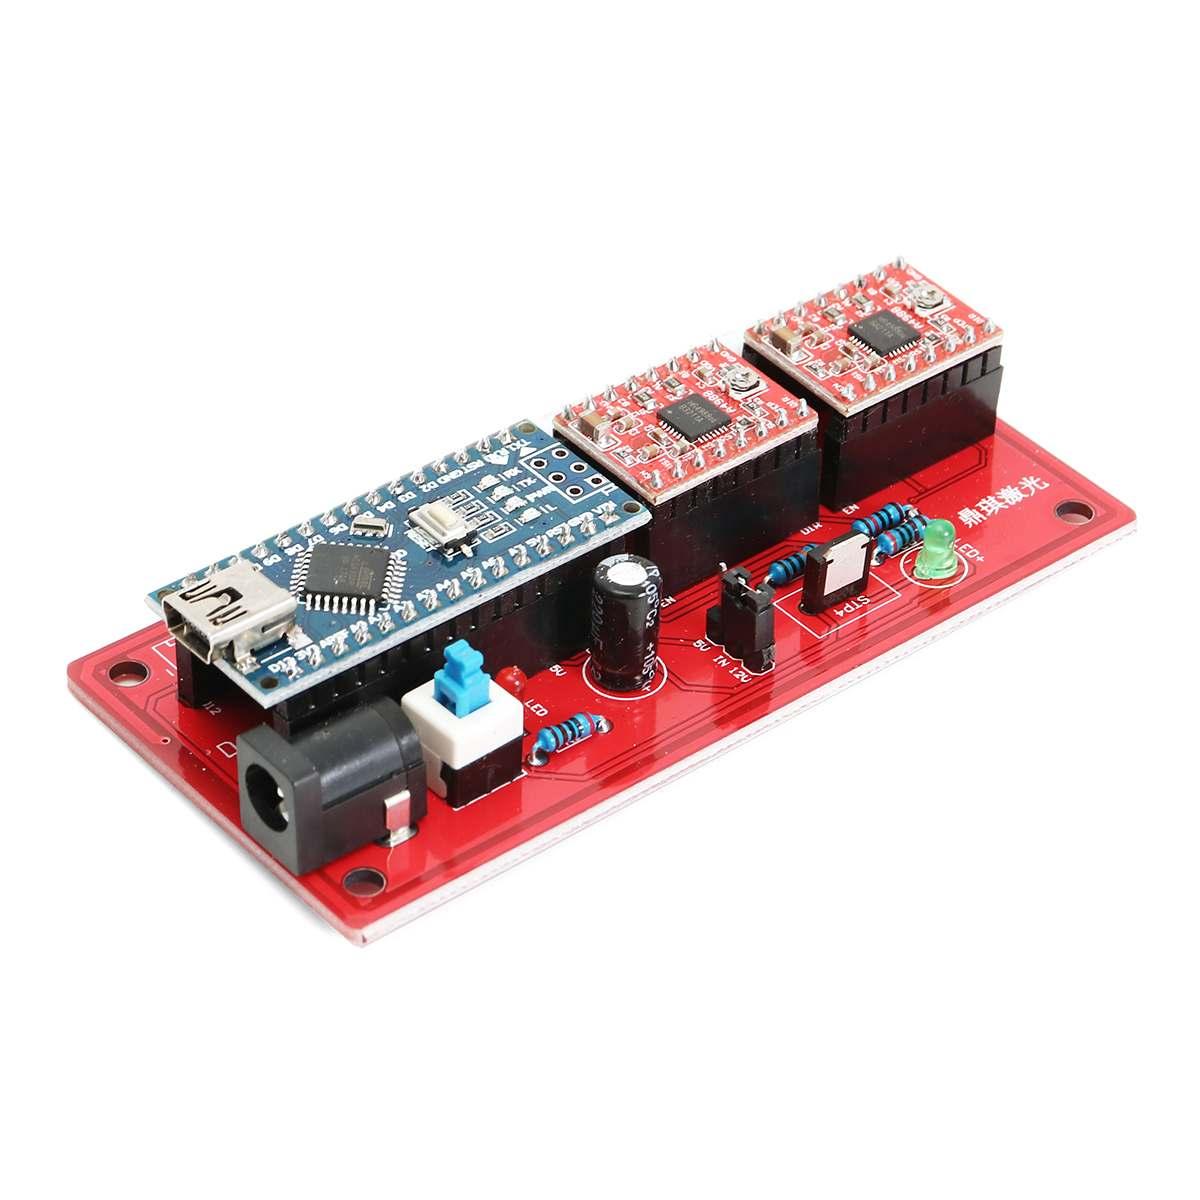 USB Control Board 2 Achse DIY CNC Laser Gravur Maschine Controller Panel Unterstützung Laser Modul Ausgang Anzeige